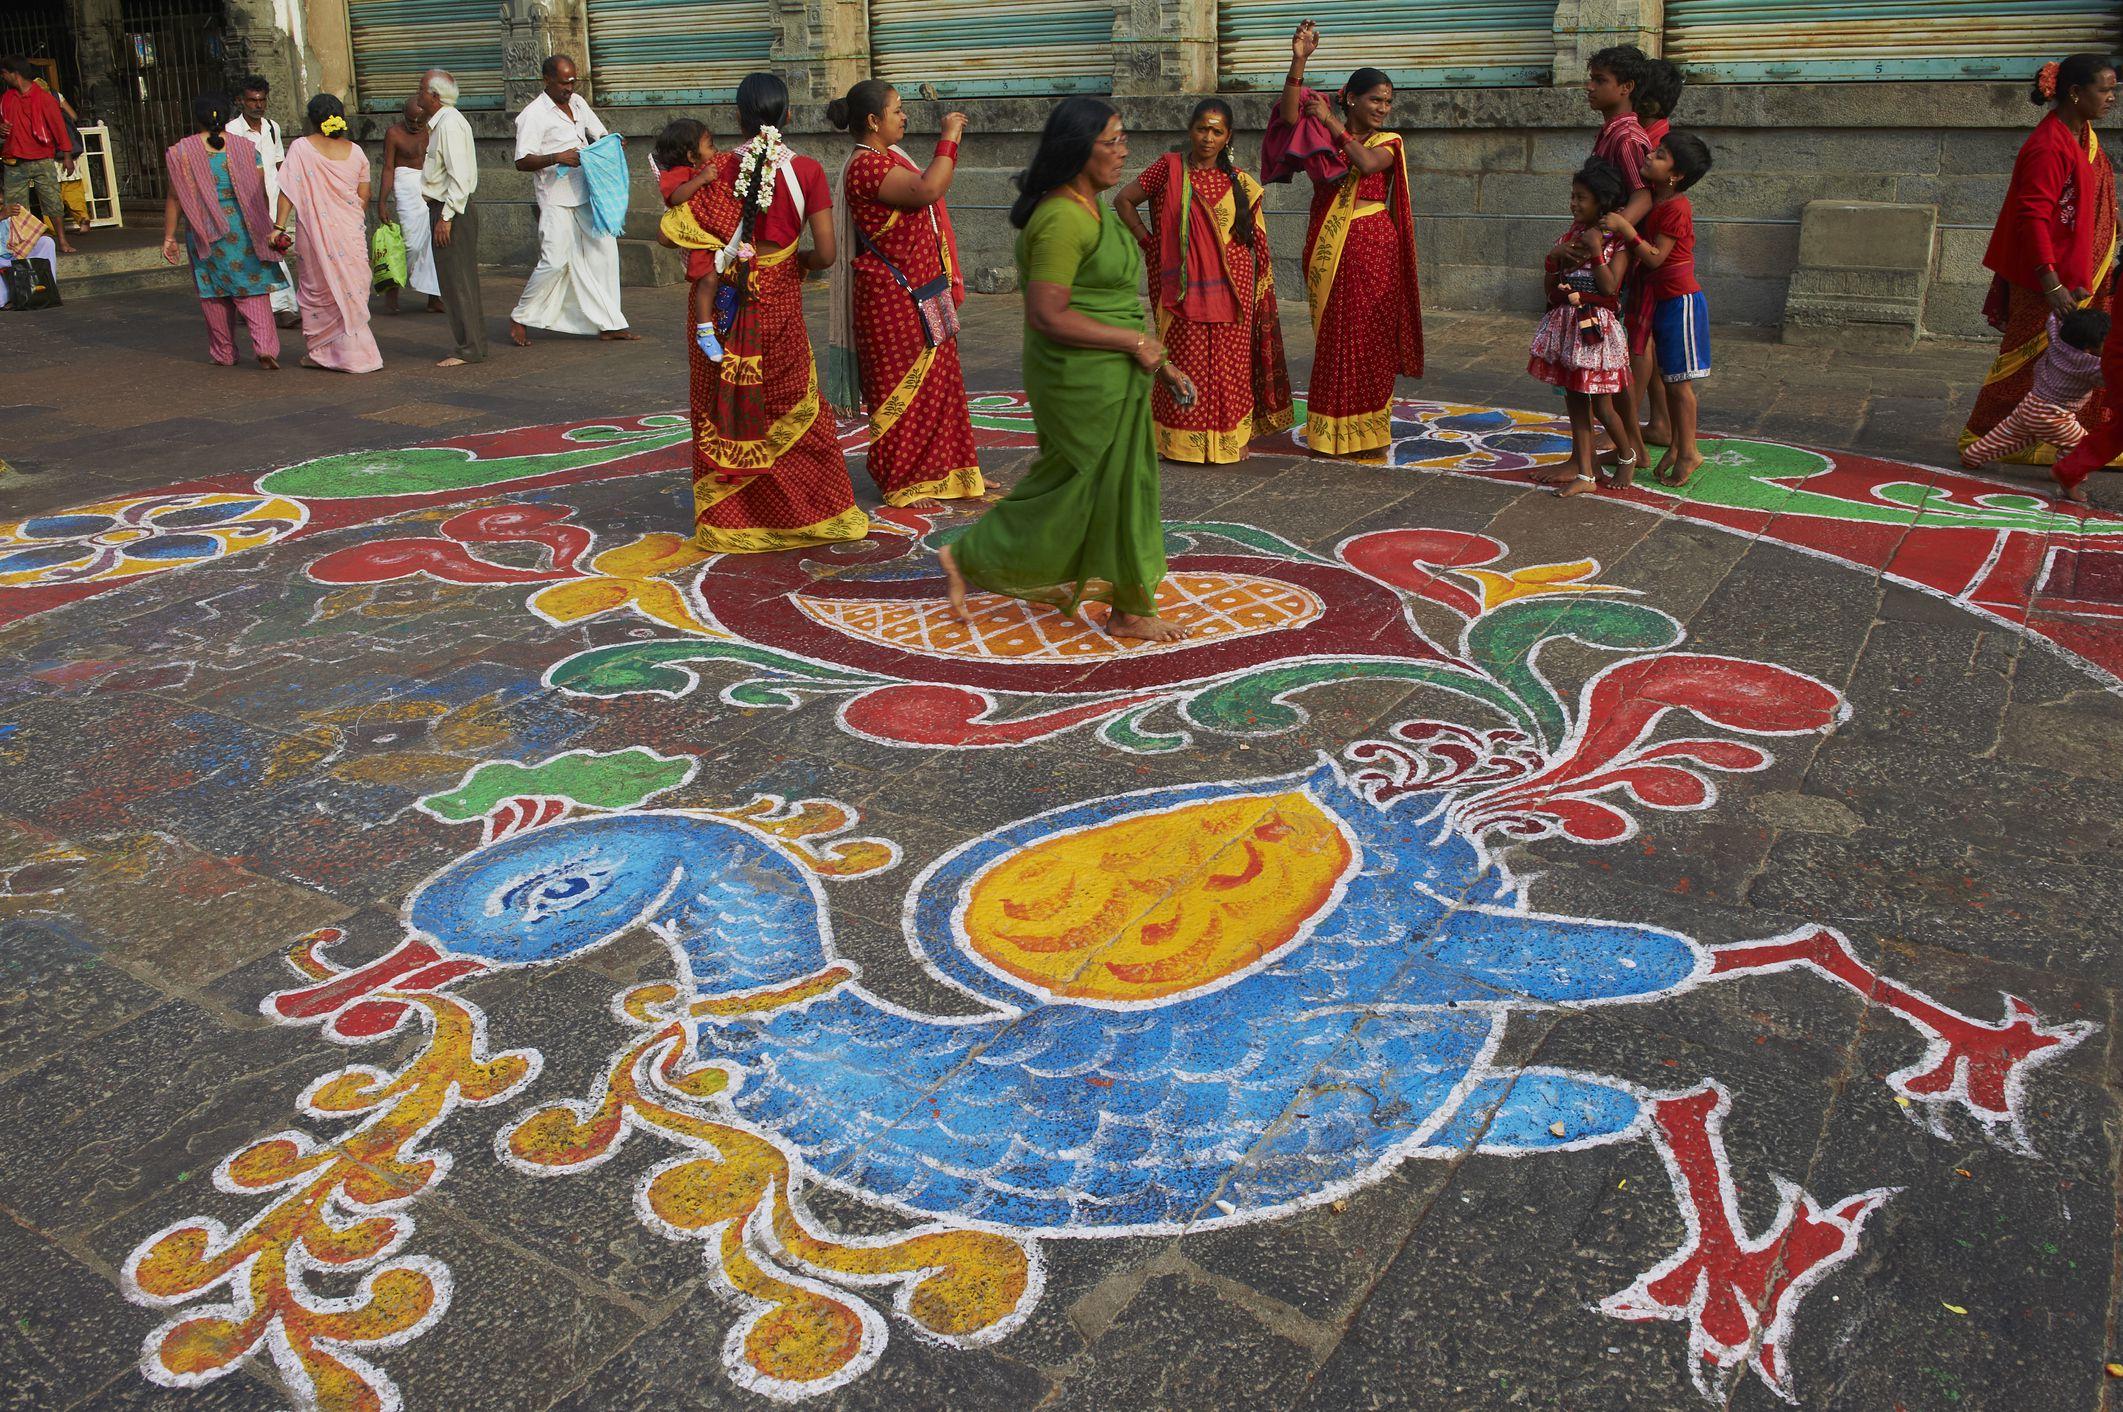 Tamil Nadu, Tiruvannamalai, Arunachaleswar temple